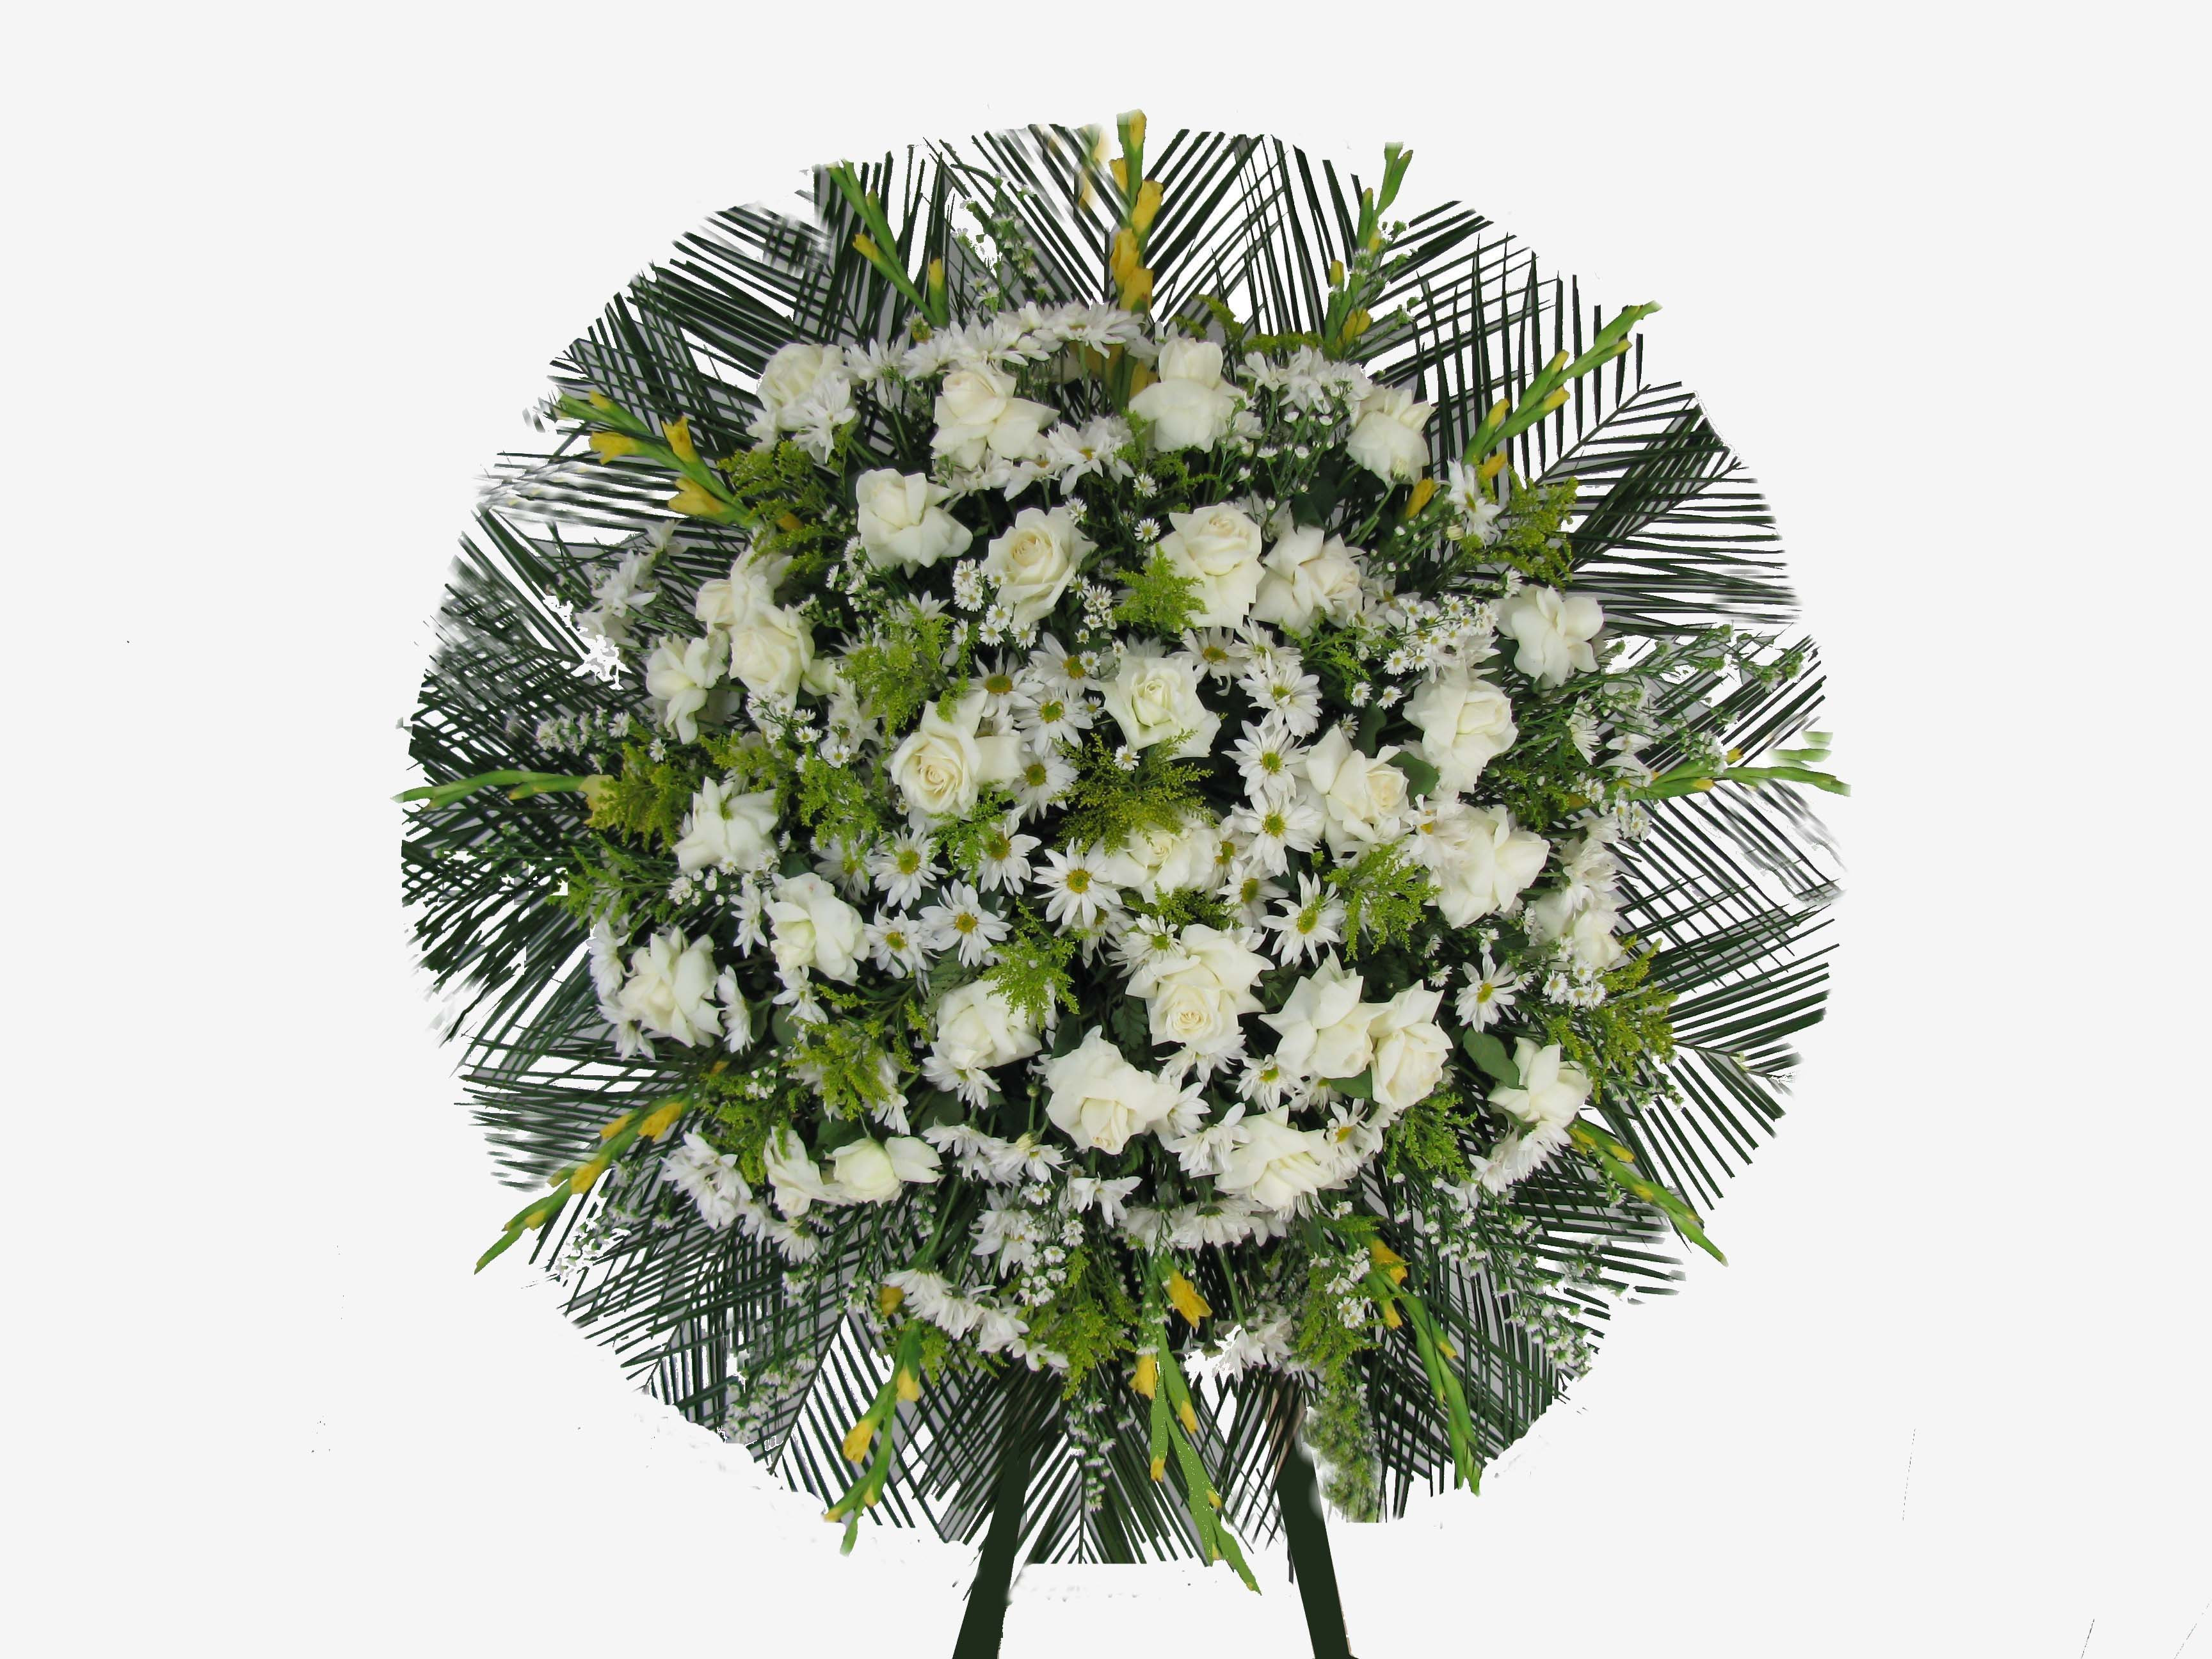 Coroas de rosas brancas